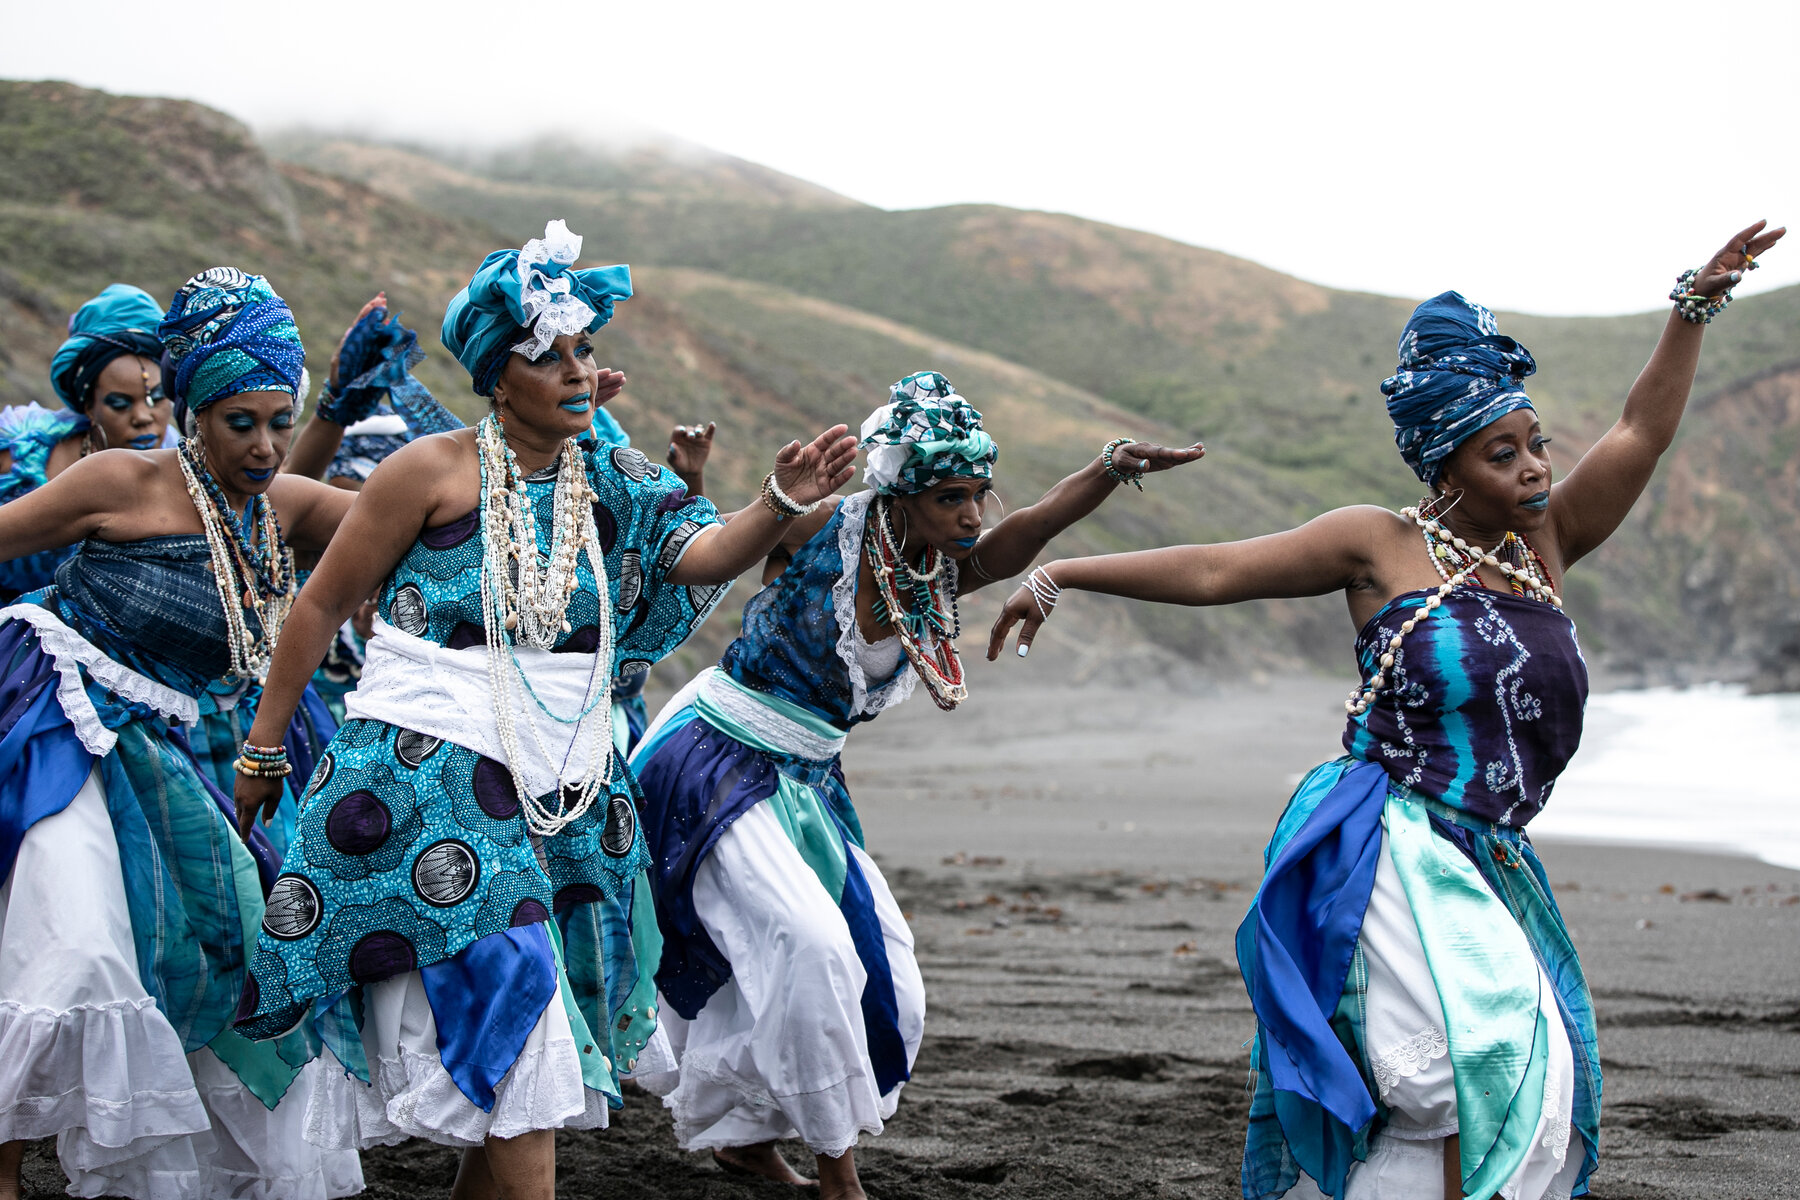 27dance-africa-1-mobileMasterAt3x